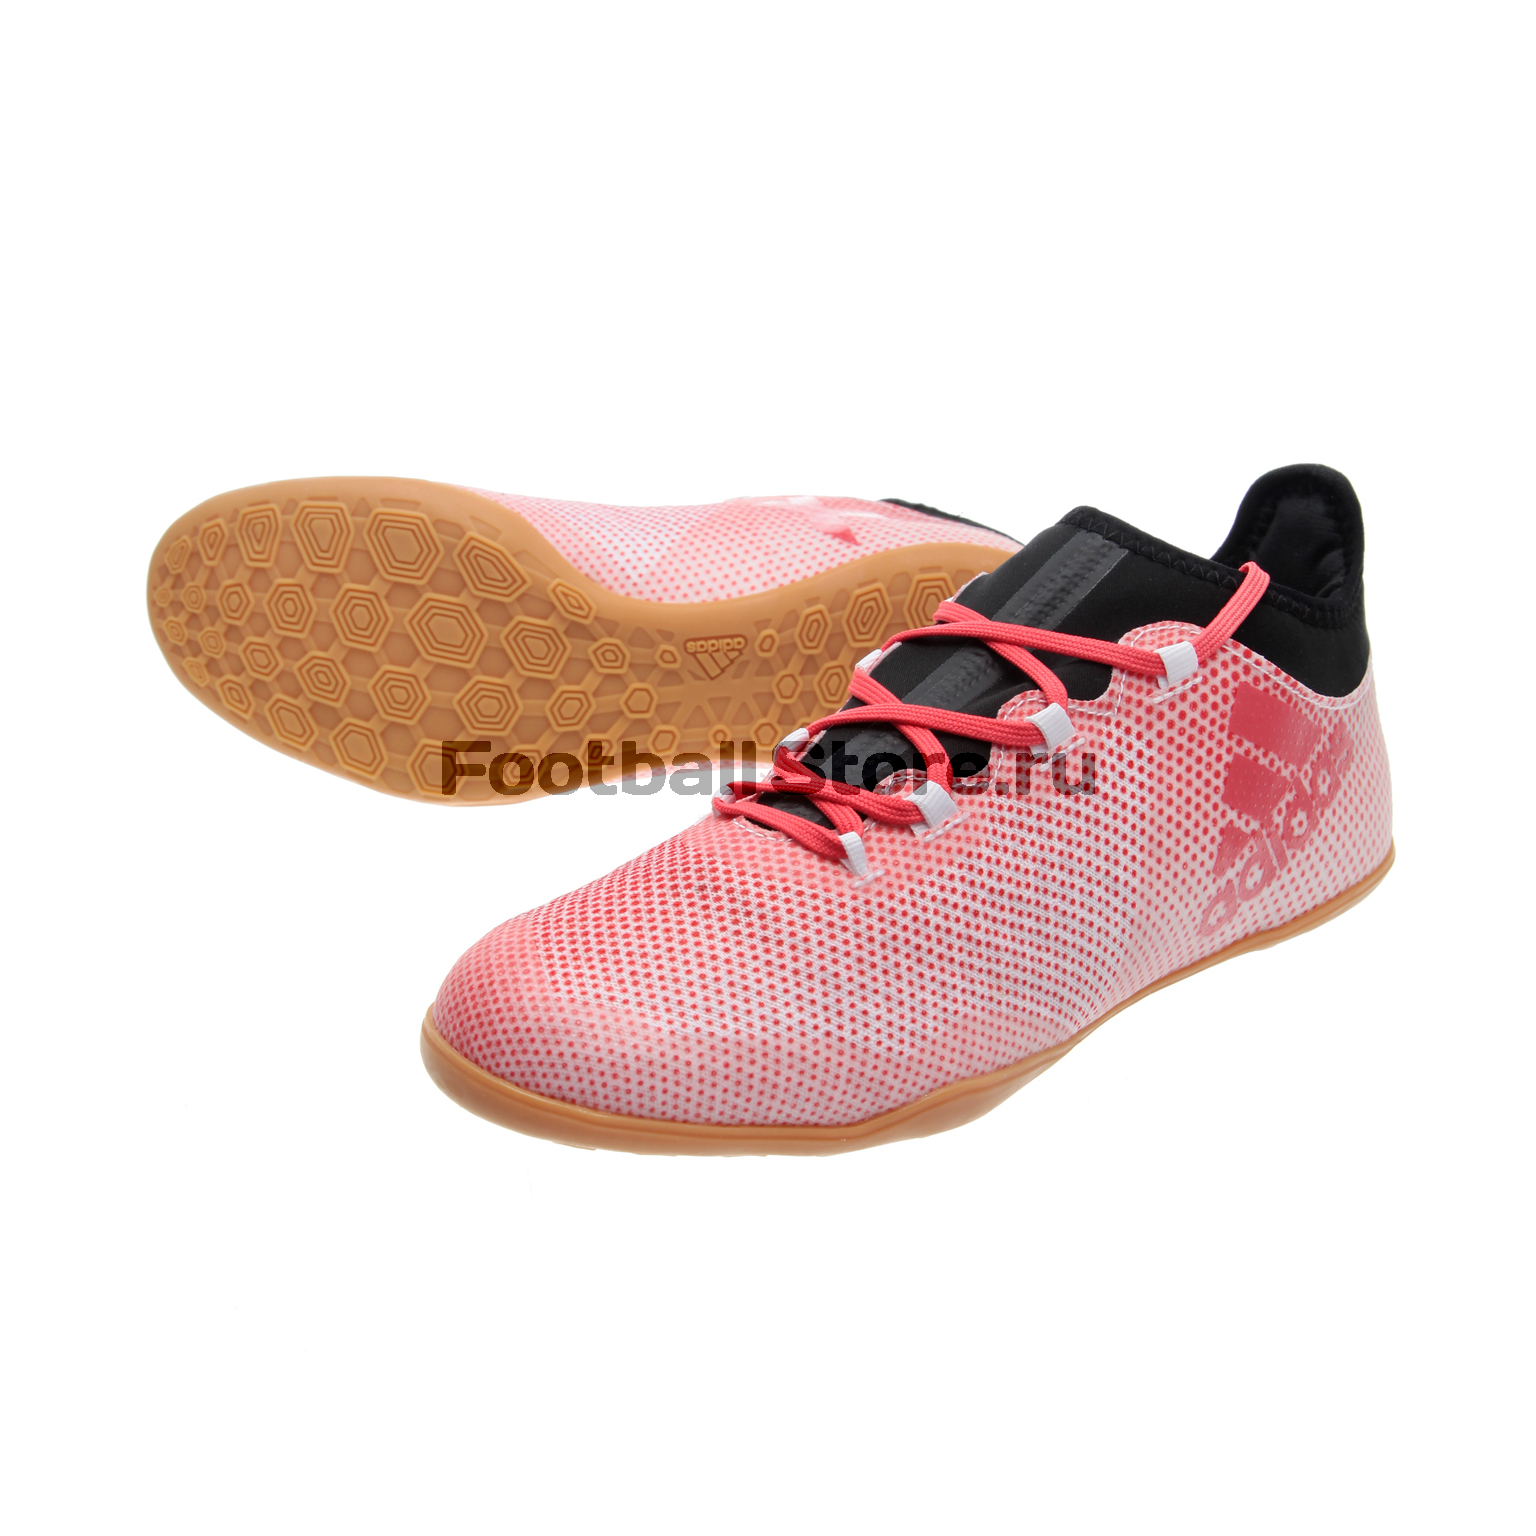 Обувь для зала Adidas X Tango 17.3 IN CP9140 обувь для зала adidas ace tango 18 3 in jr cp9075